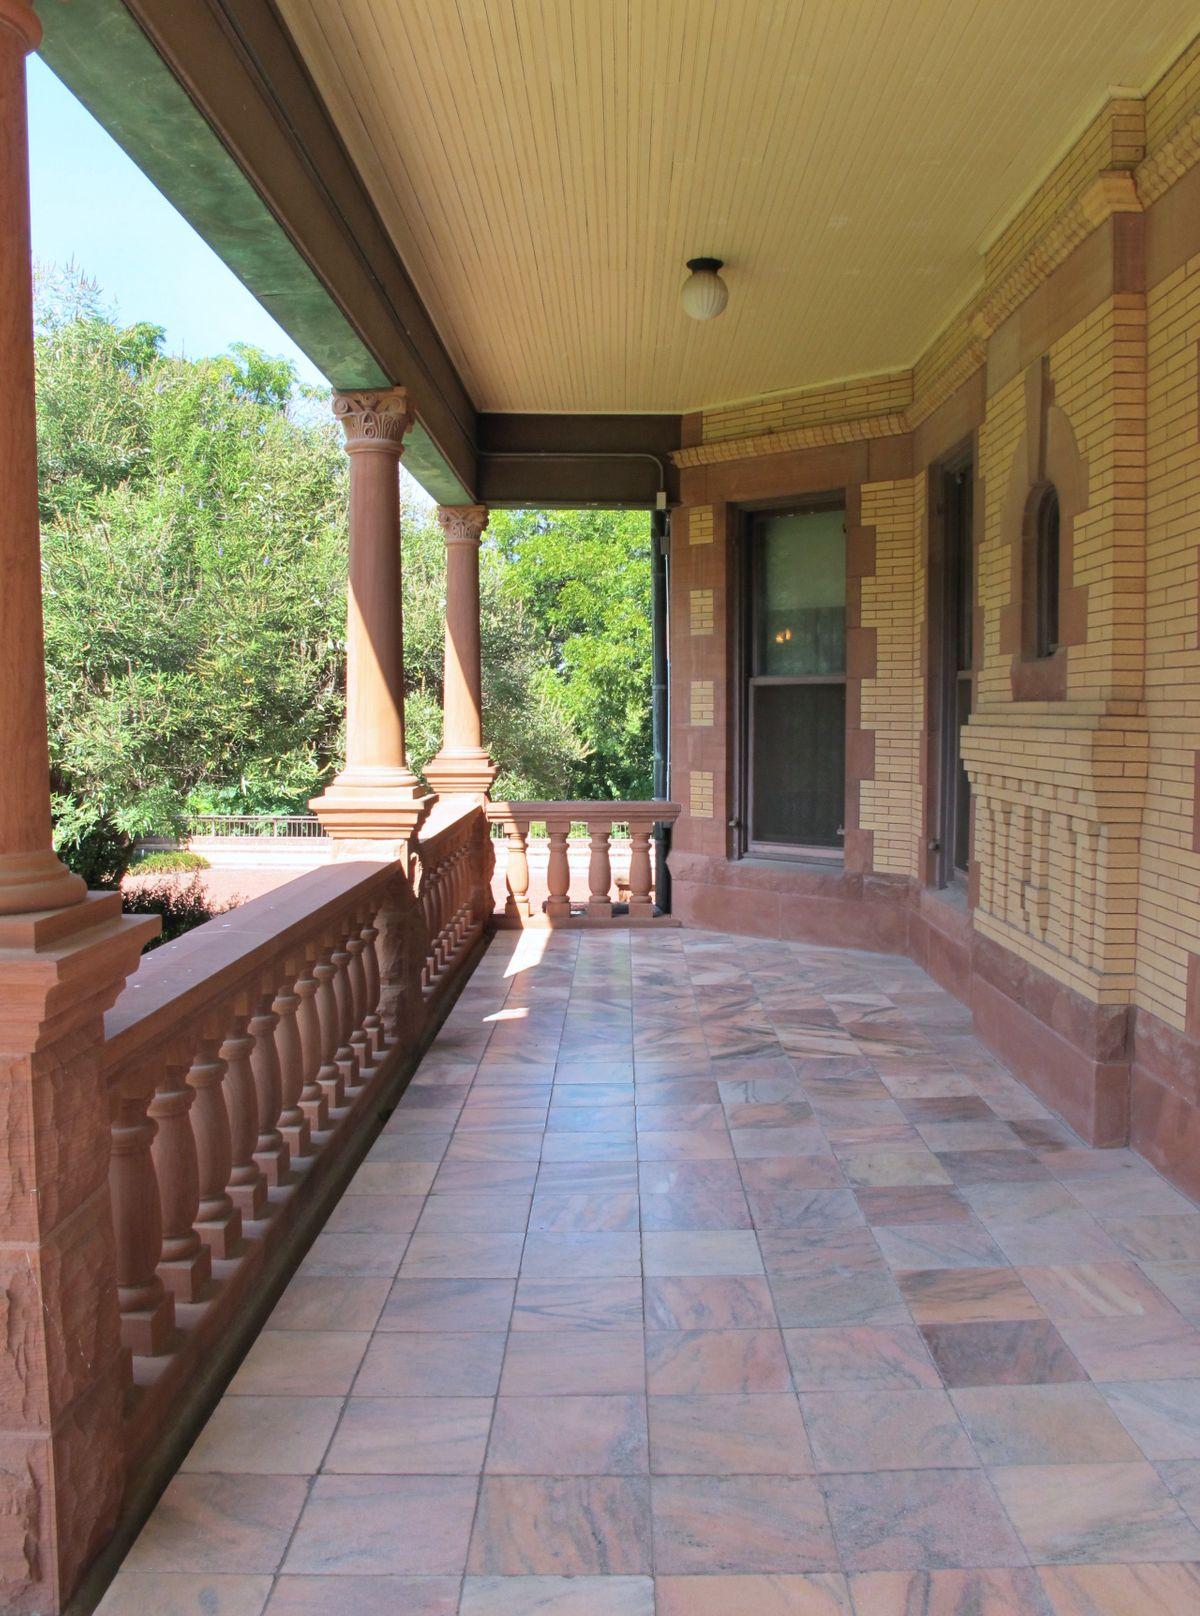 McFarland Historical Home Photo Video Shoot Location Dallas 27.jpg